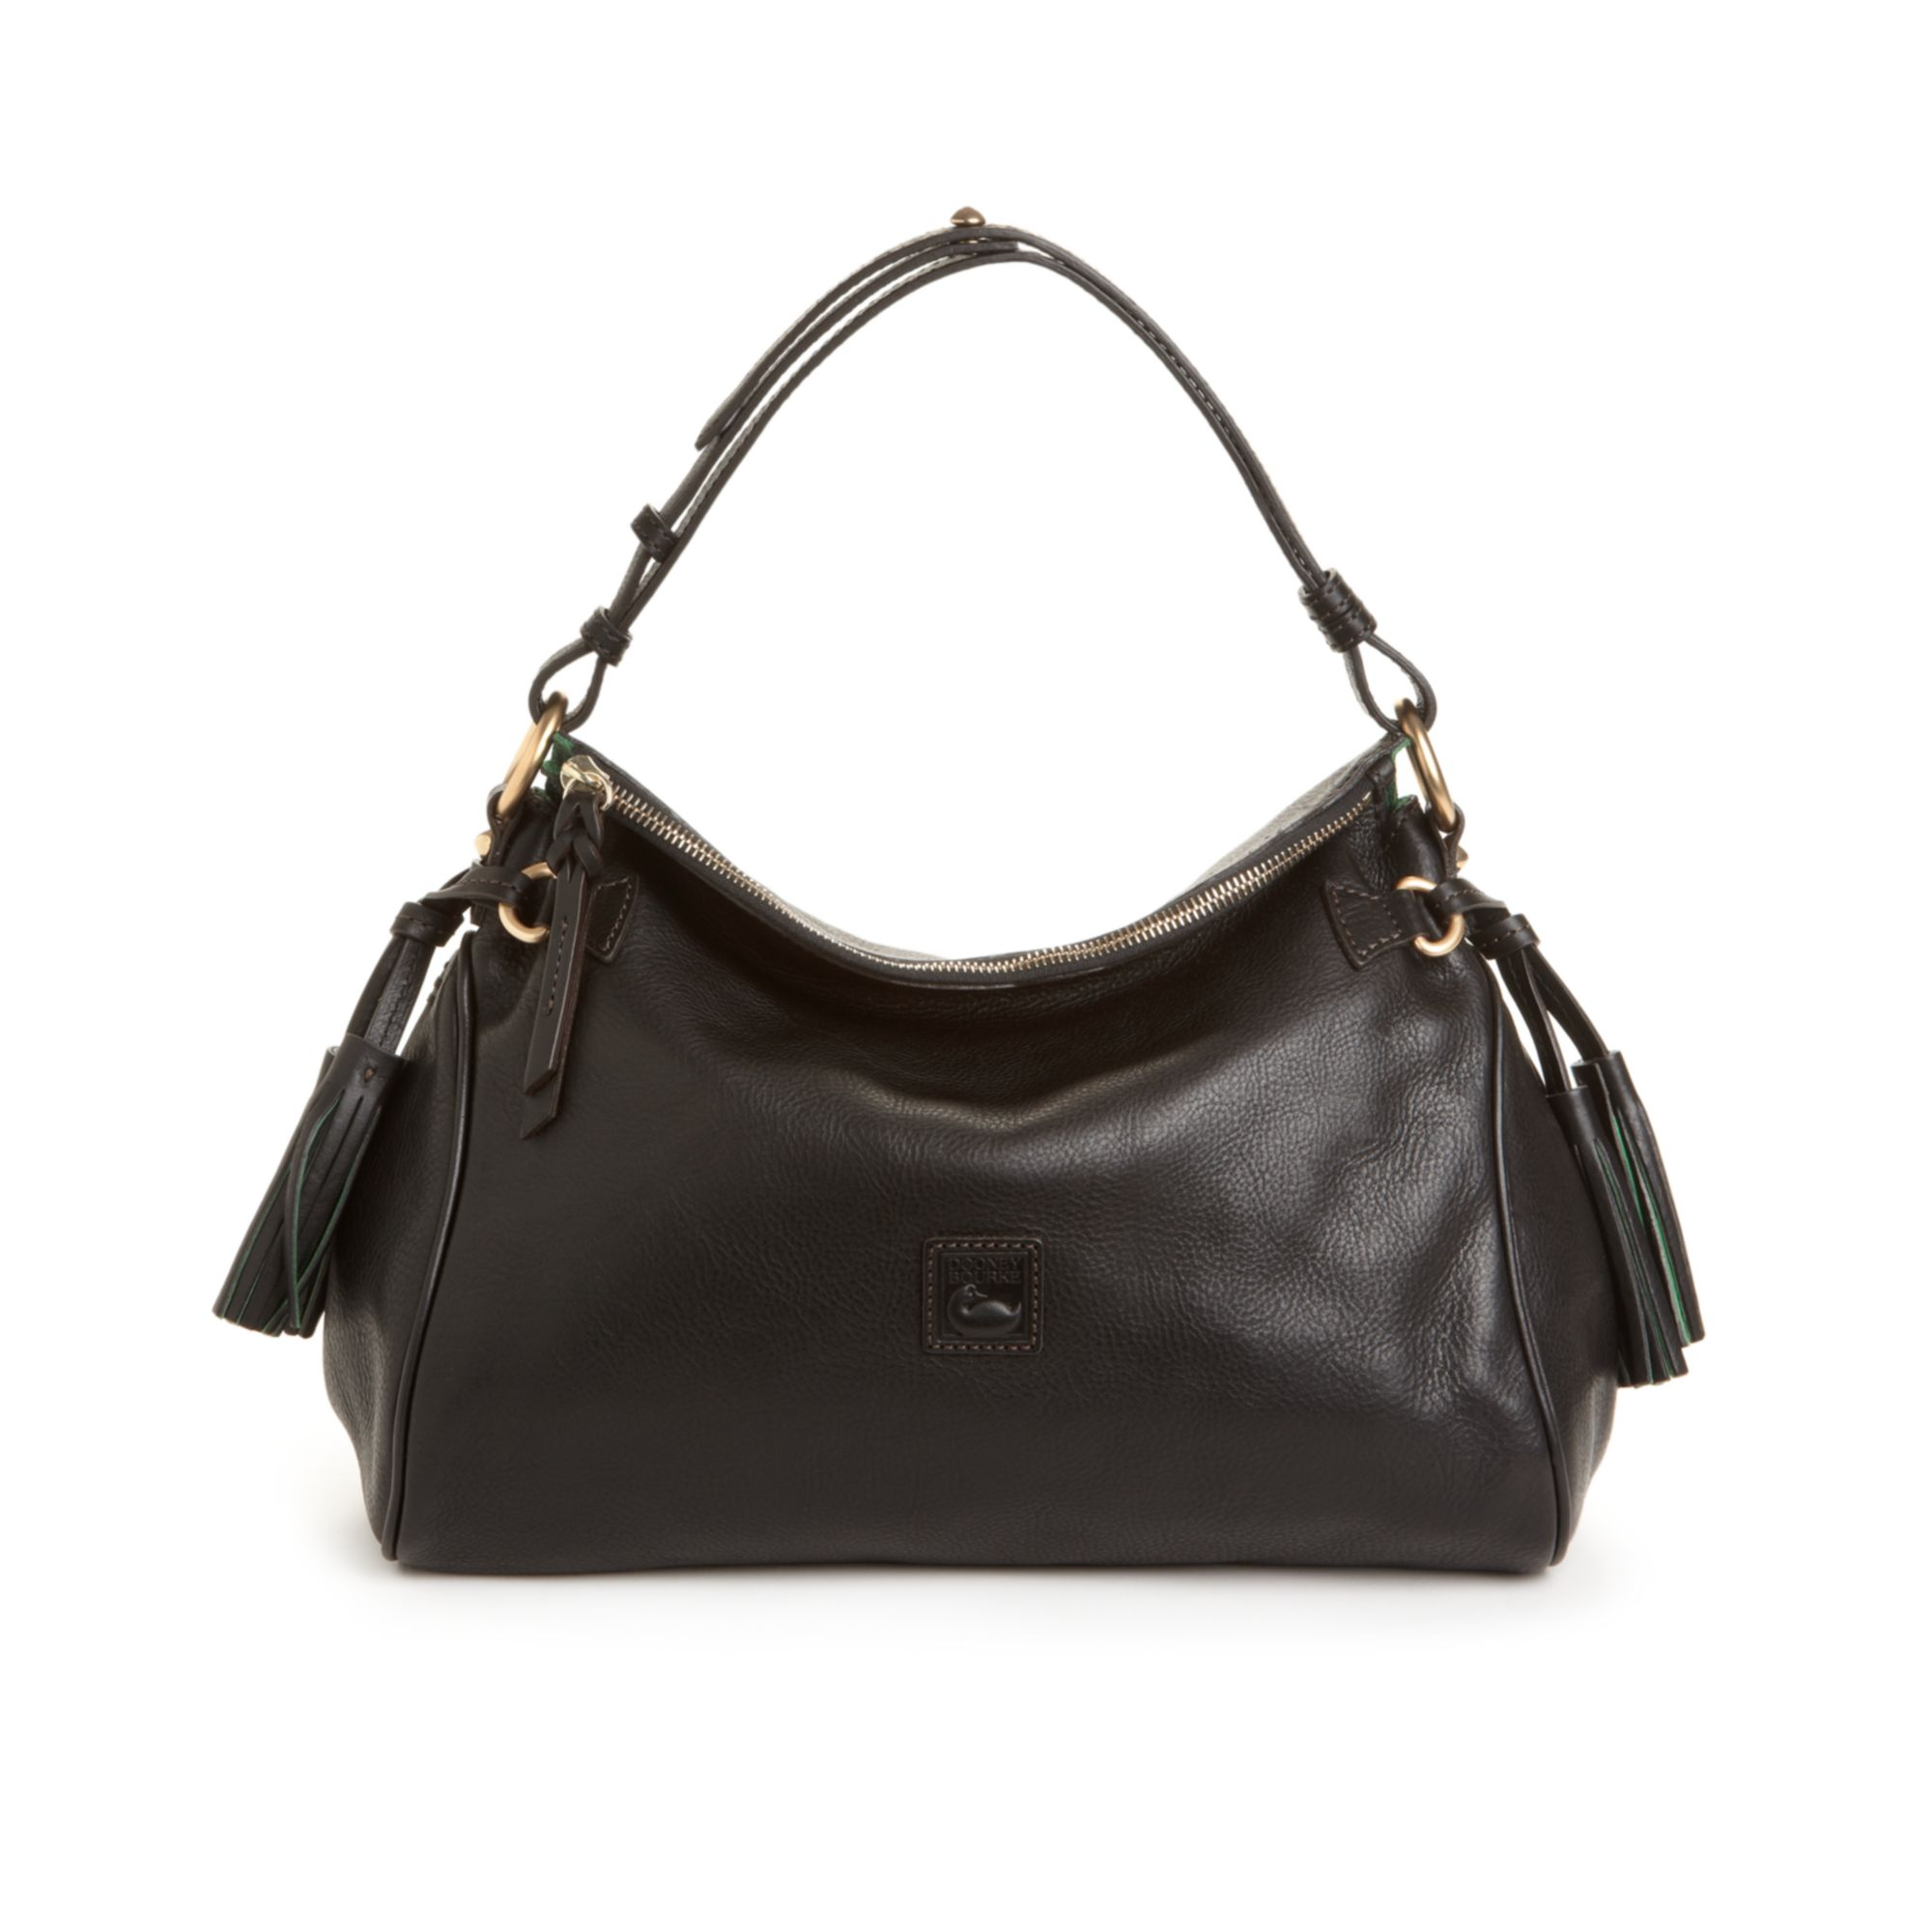 952b4d19e33 Lyst - Dooney   Bourke Florentine Vachetta Medium Zip Hobo Bag in Black